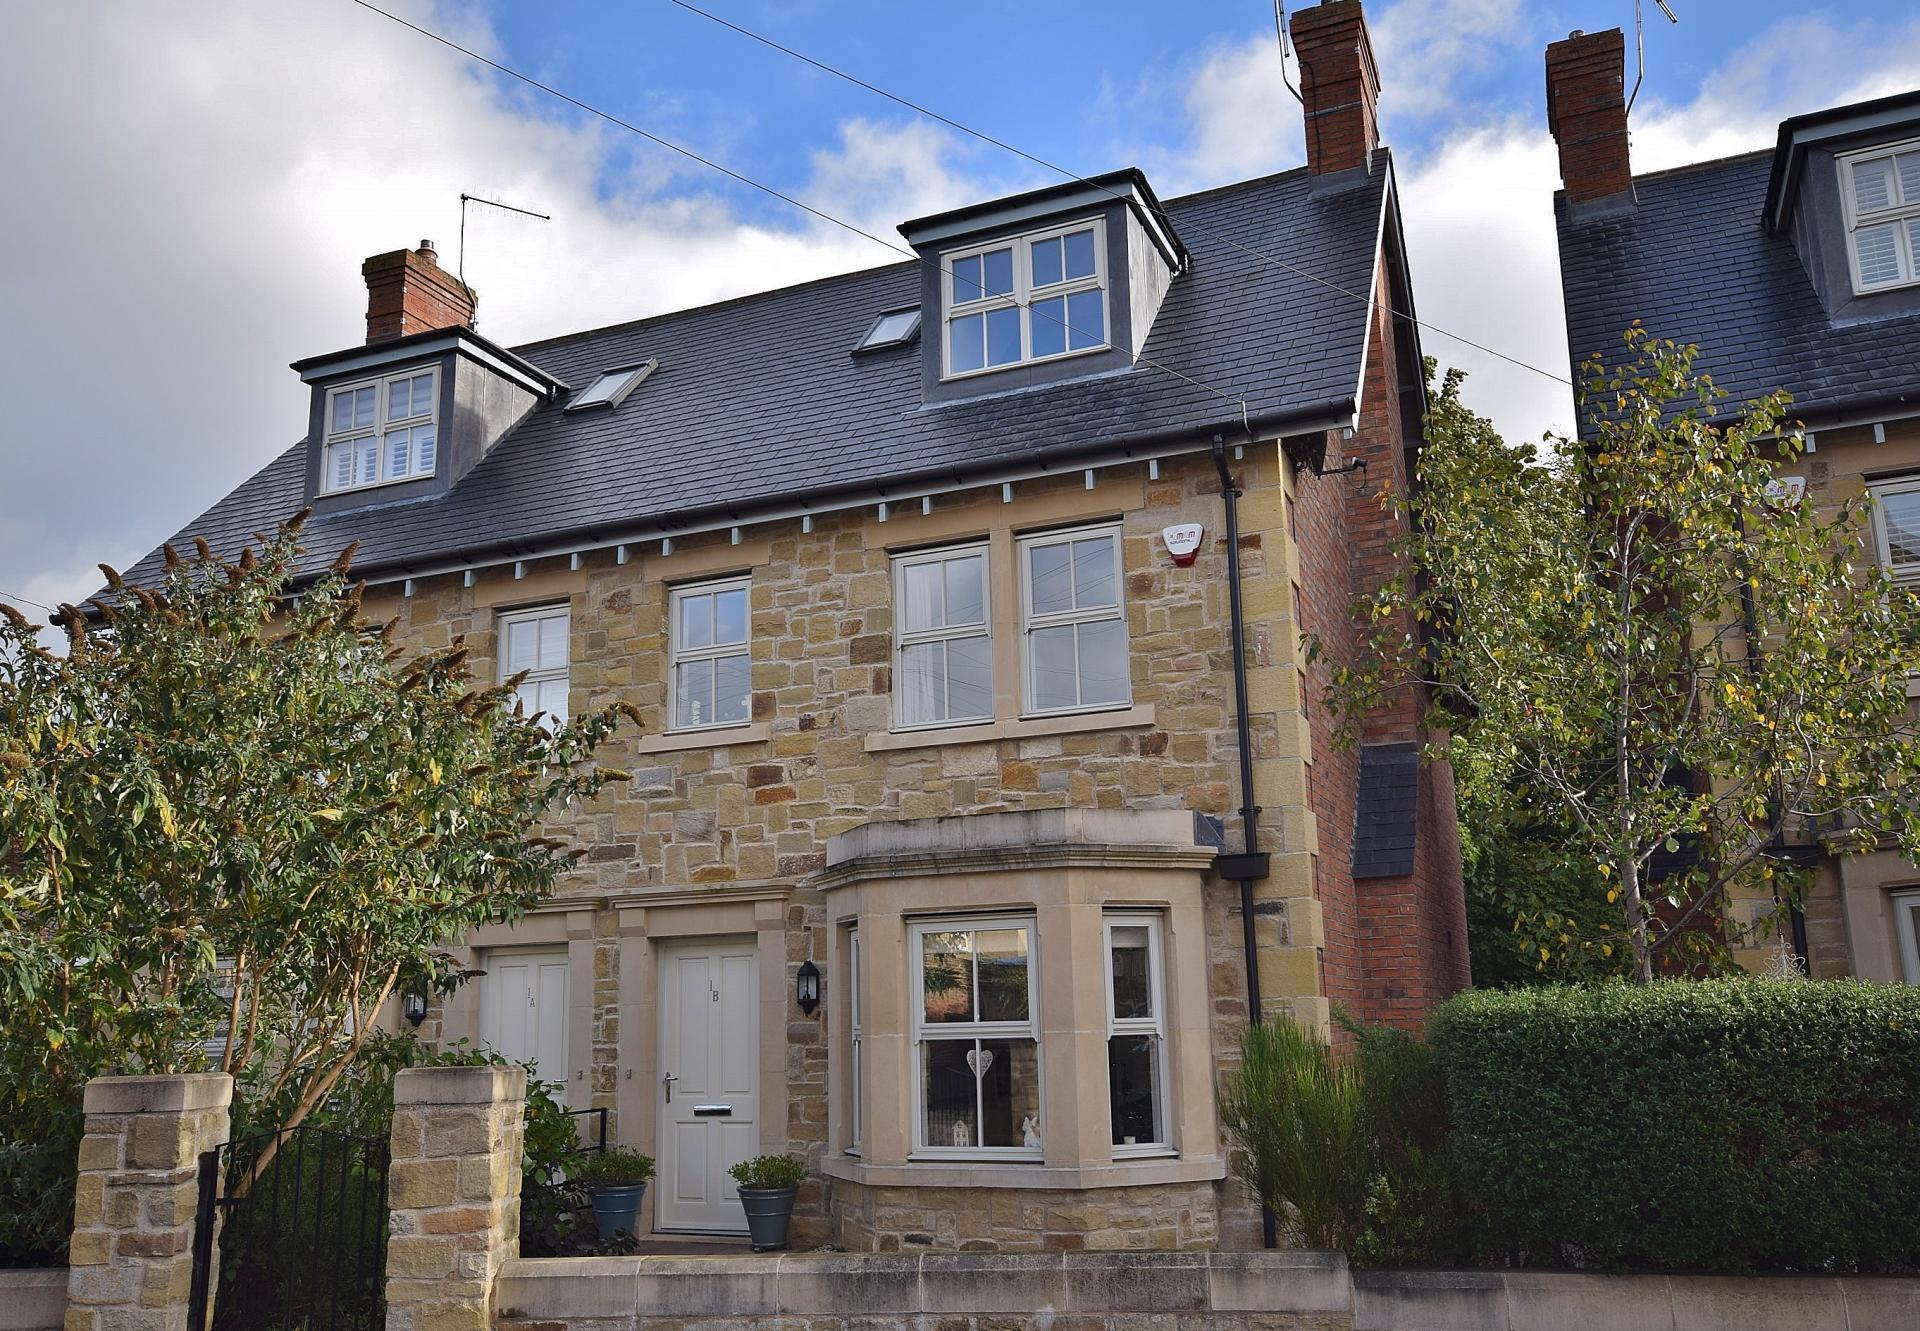 4 Bedrooms Property for sale in Shaftoe Crescent, Hexham